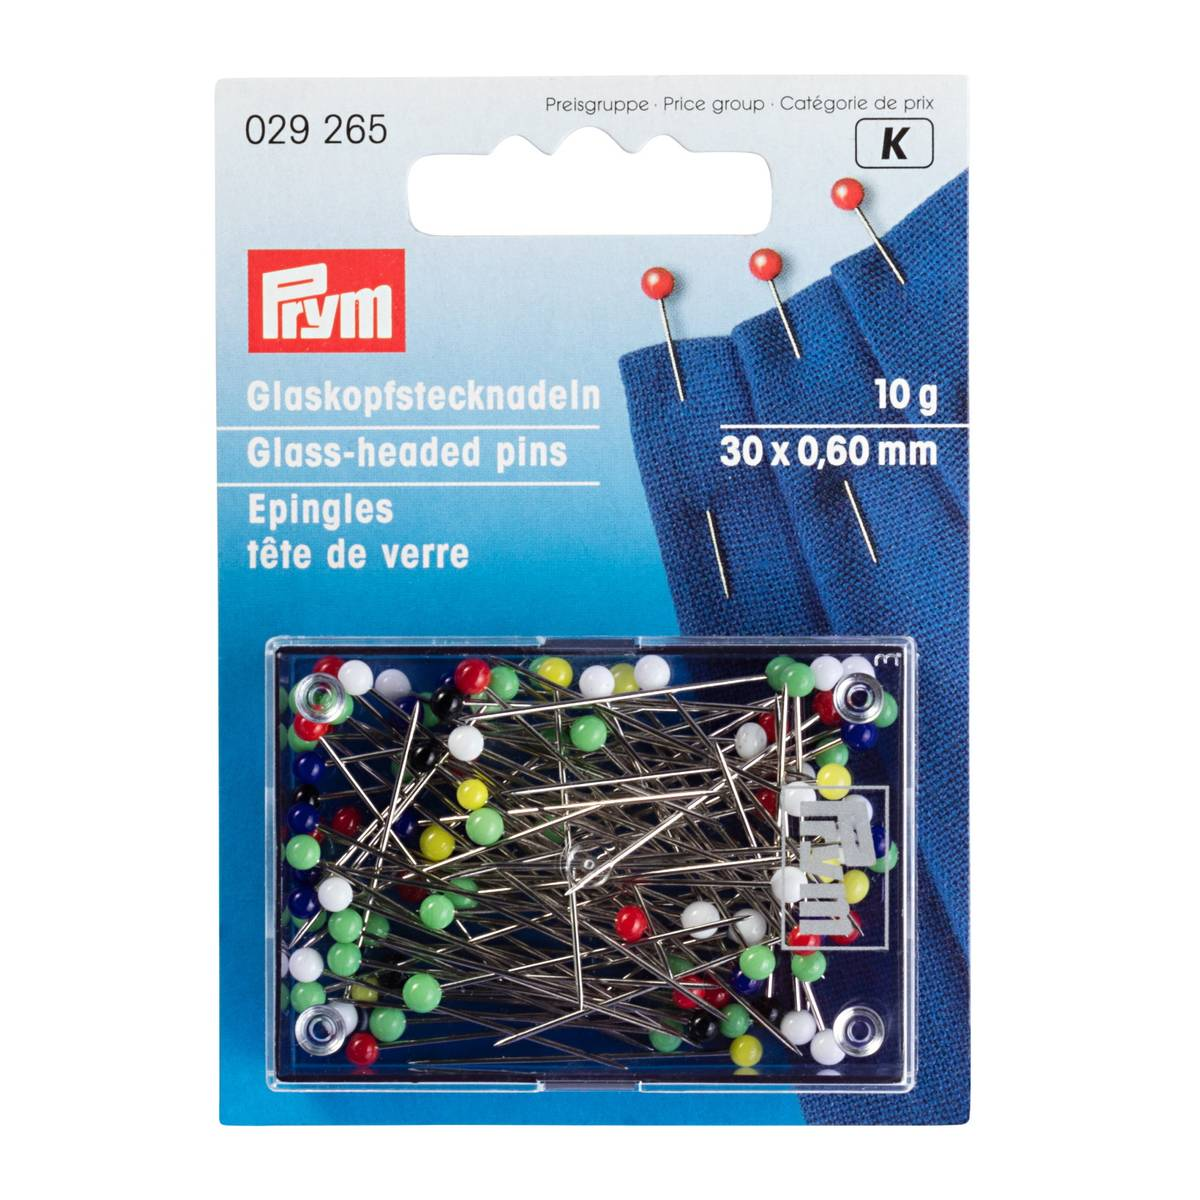 Prym Knappenåler m/Glasshode - 30x0,60mm 10g 029265